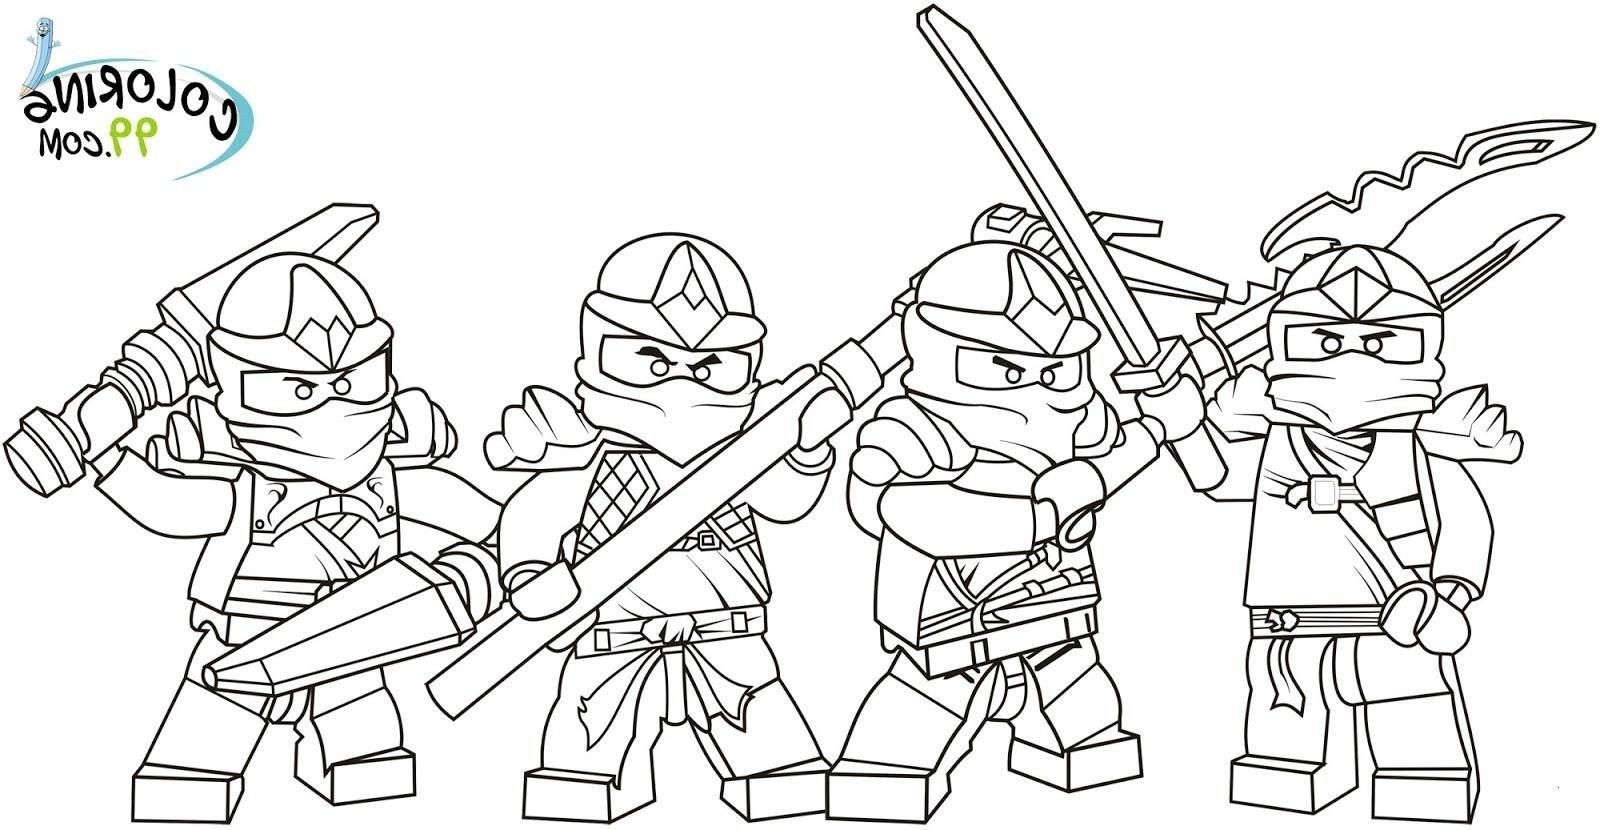 Ninjago Ausmalbilder Lord Garmadon Genial 30 Lecker Ninjago Morro Ausmalbilder – Malvorlagen Ideen Sammlung